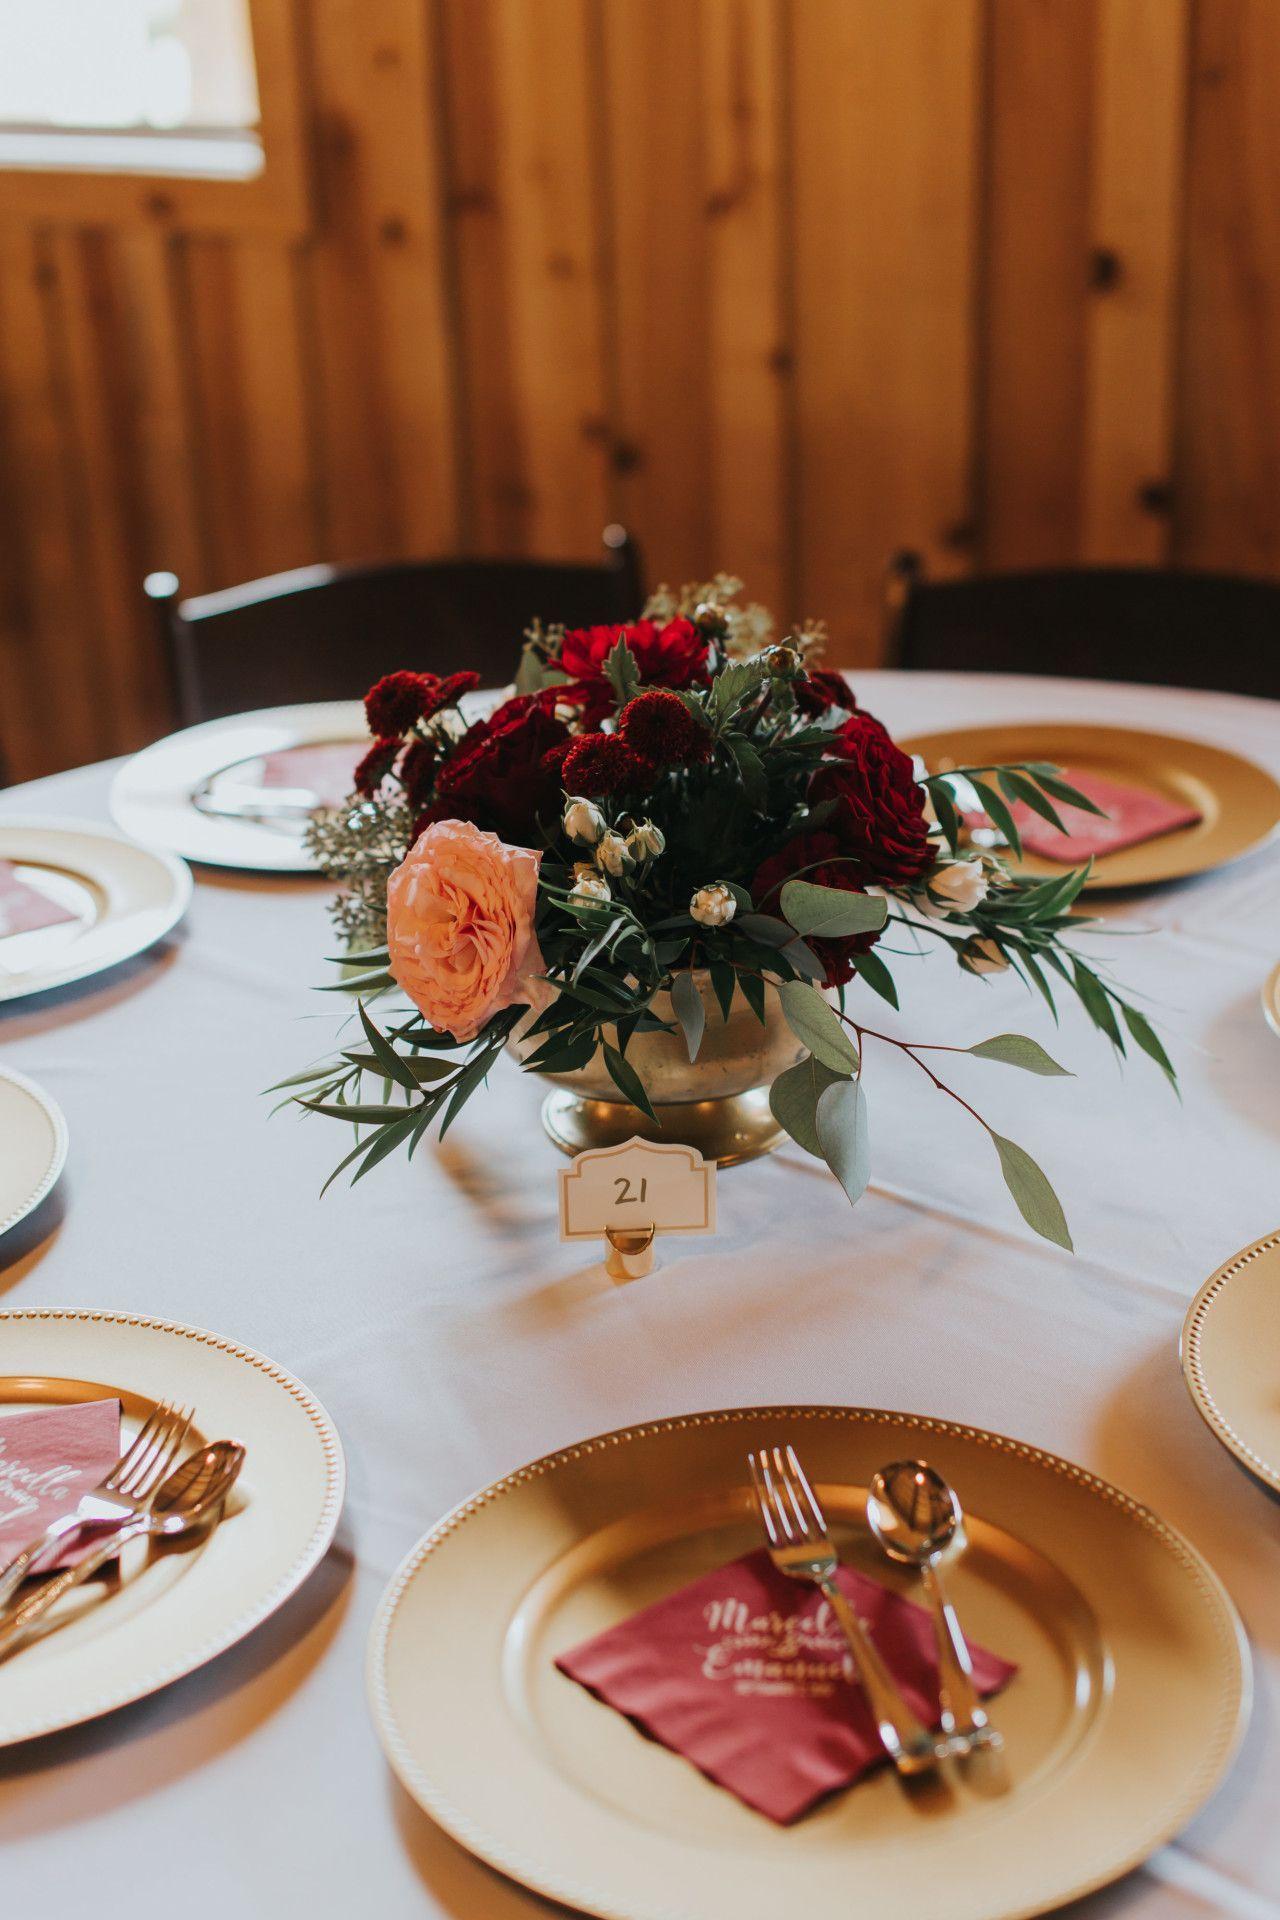 Wedding decor maroon  deep red  blush pink wedding centerpieces  gold  maroon wedding